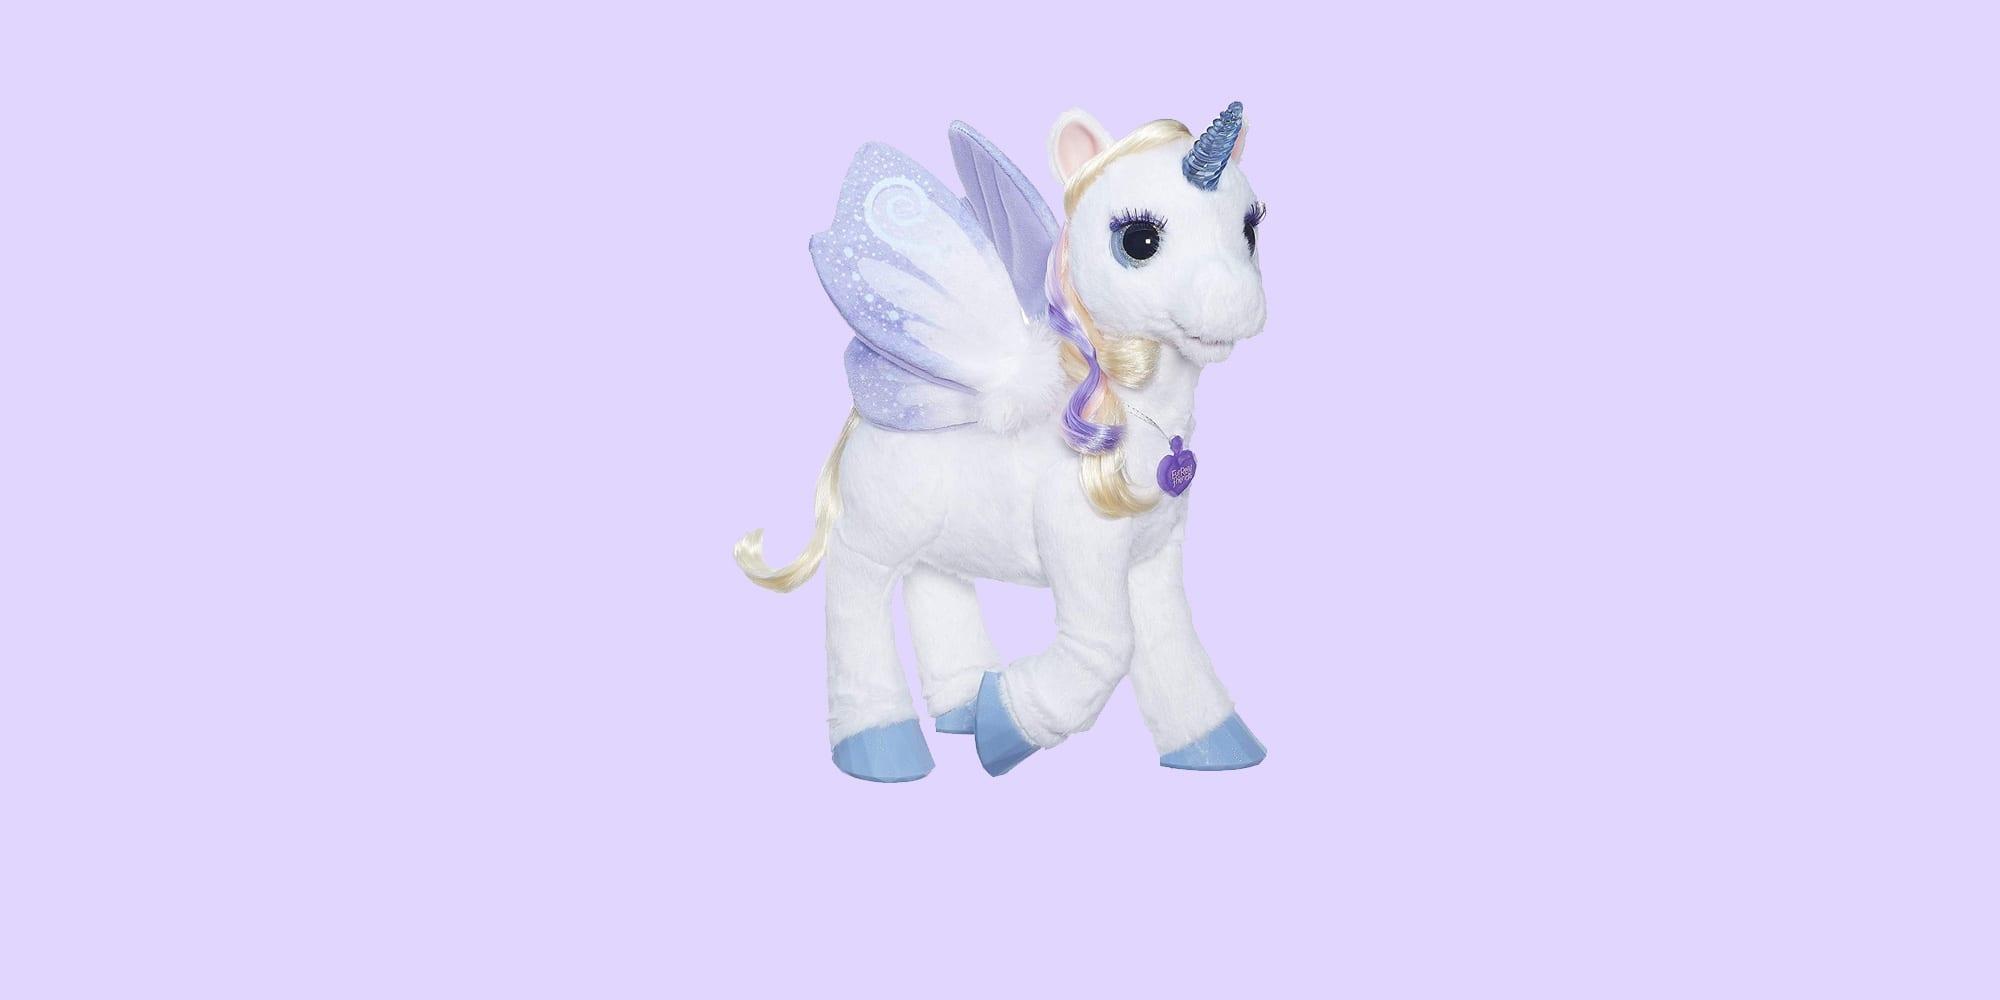 Unicorn Toys For Girls